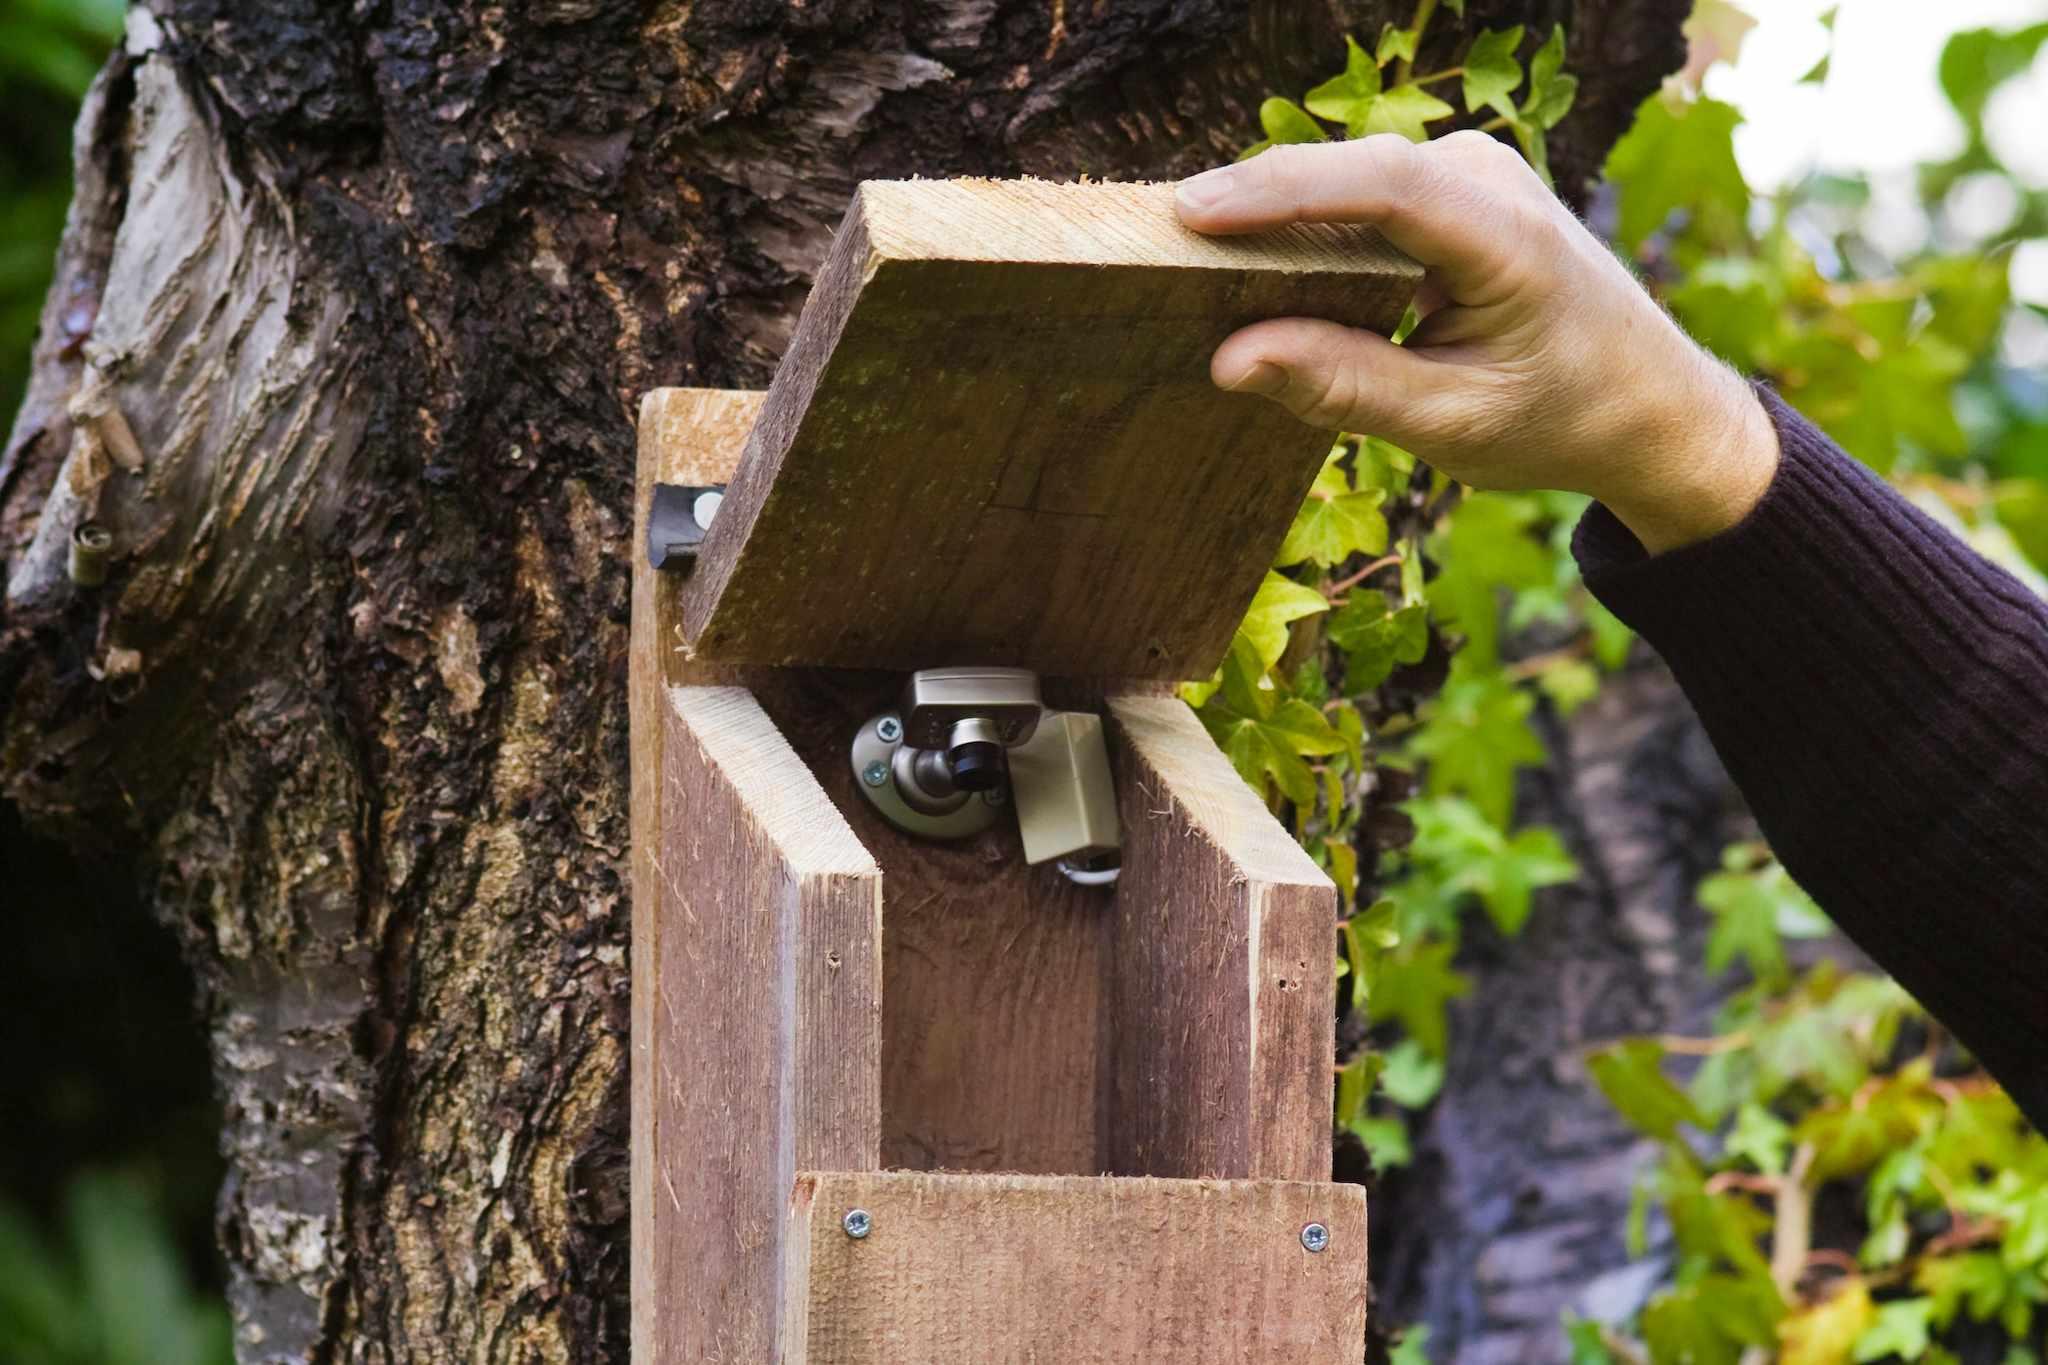 How to install a nest box camera